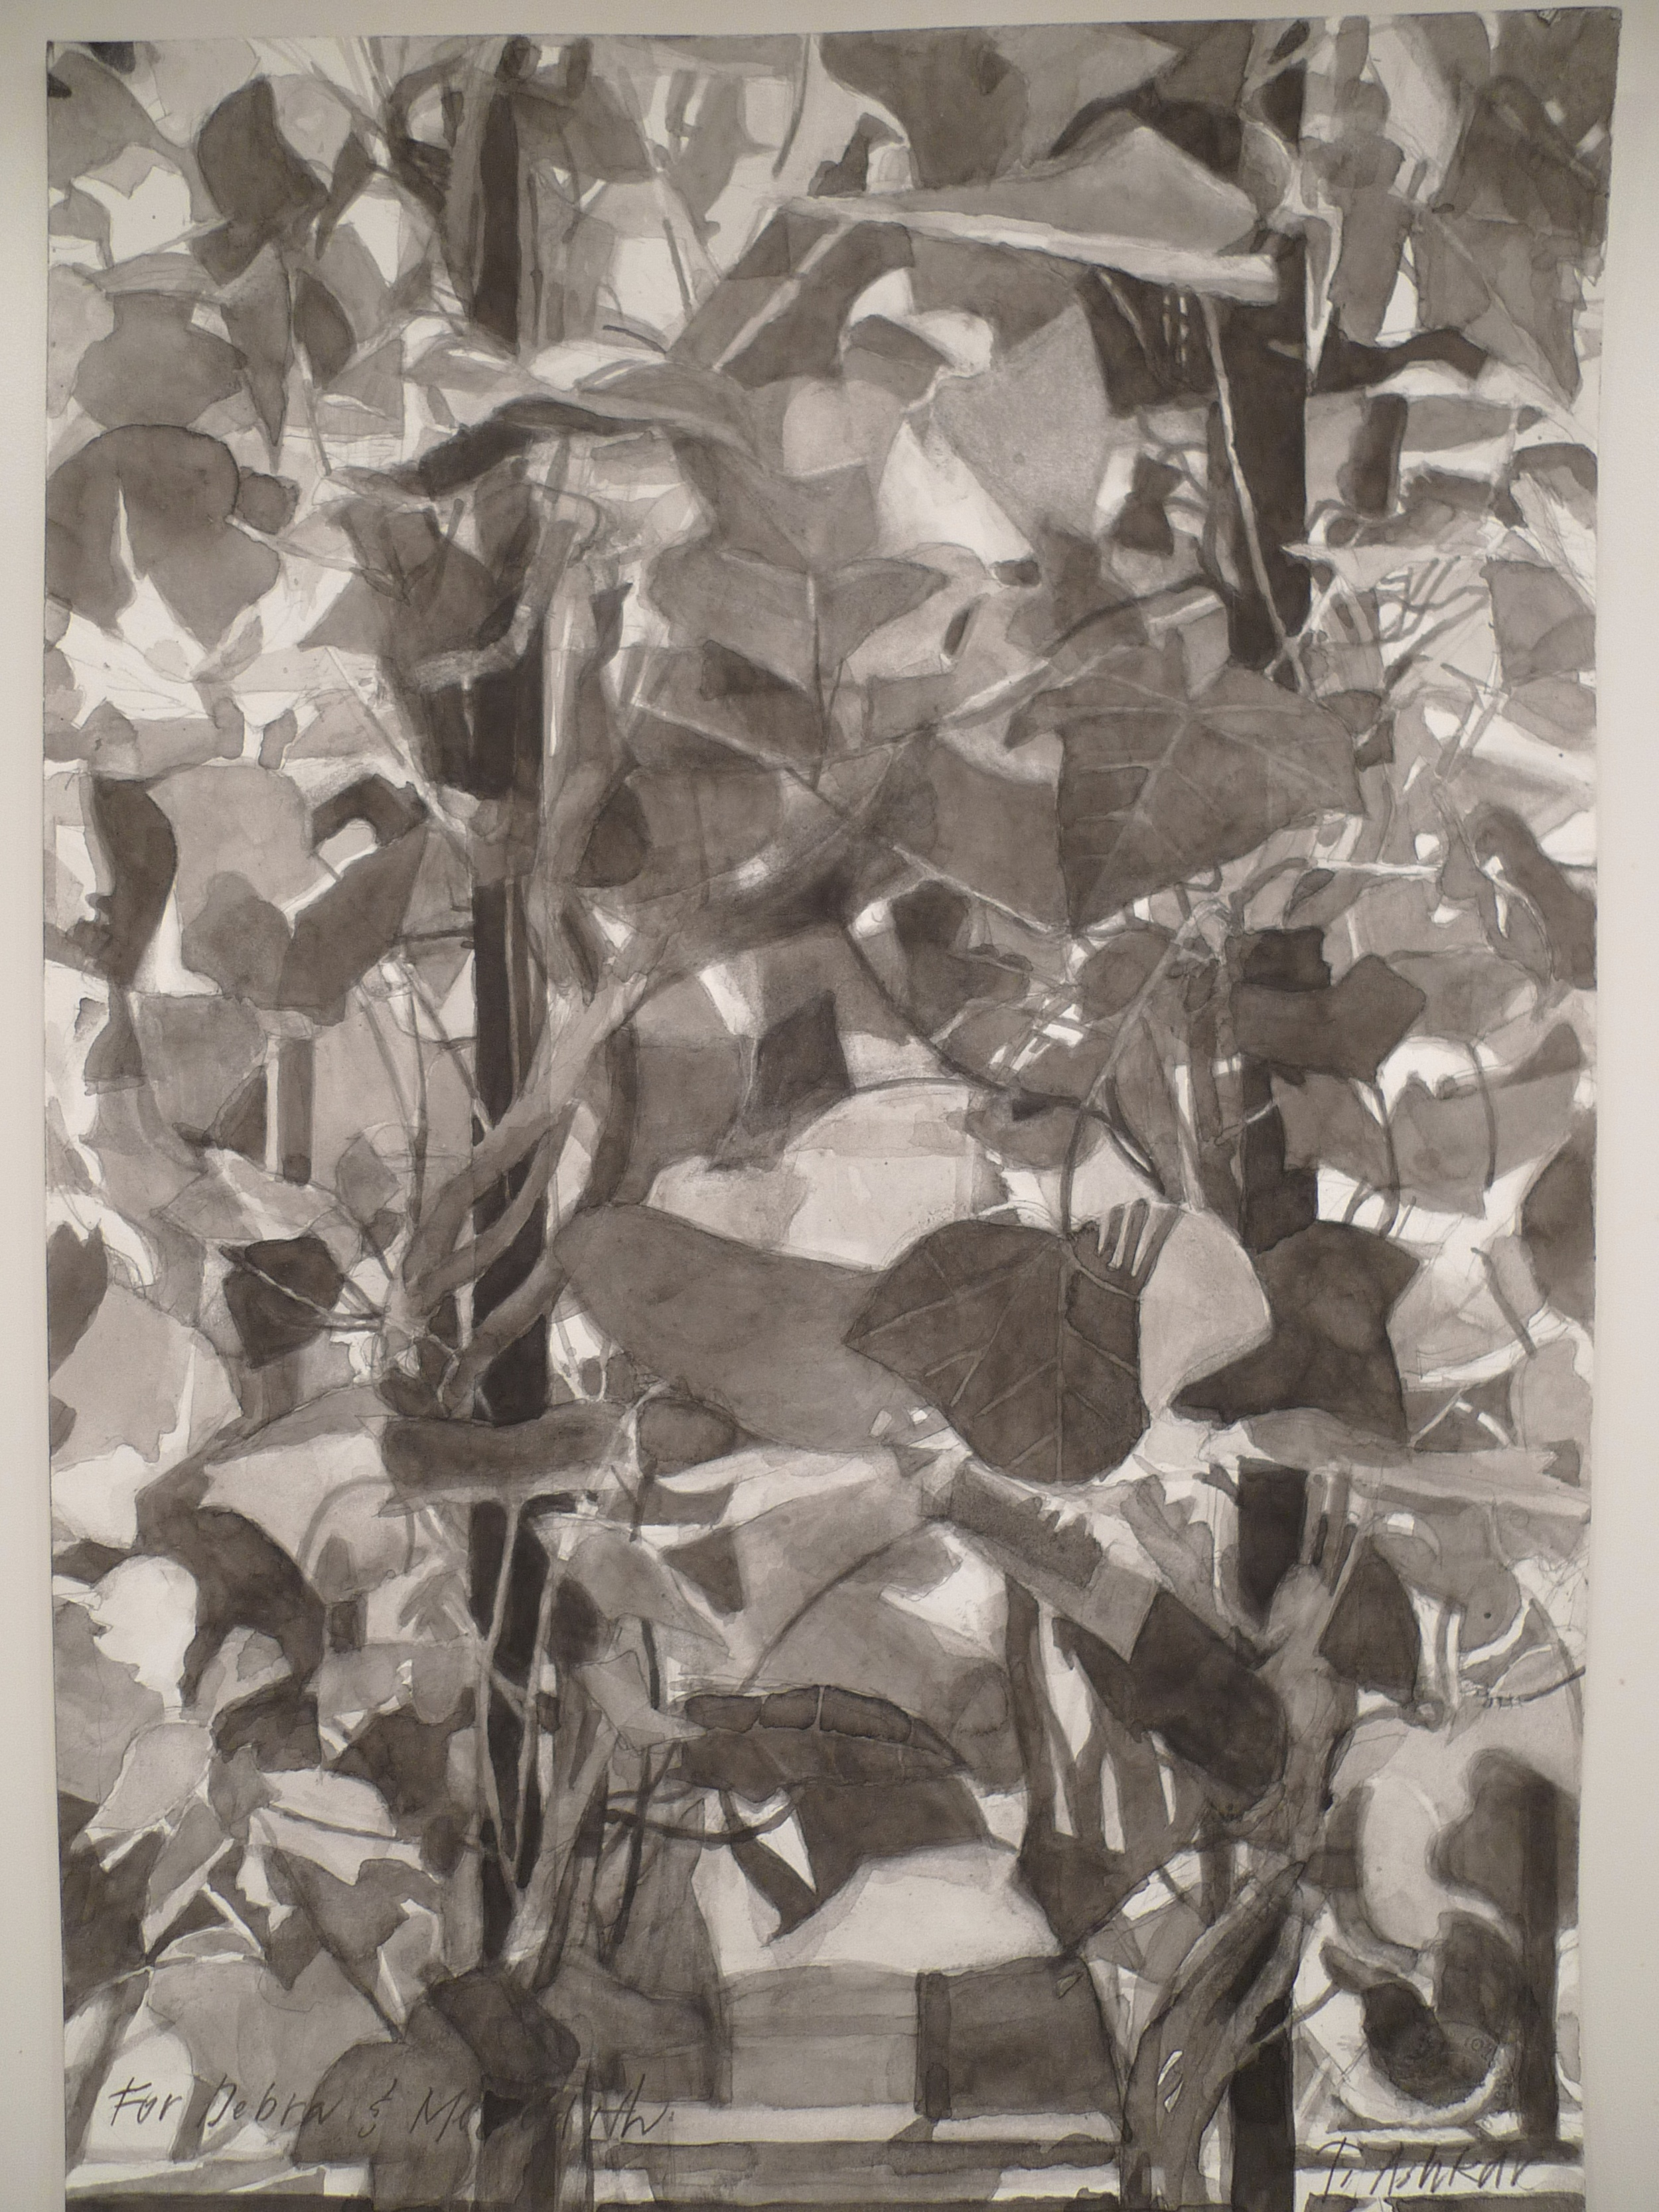 India Ink on Paper 8 x 12 inches Tarek Ashkar,2013